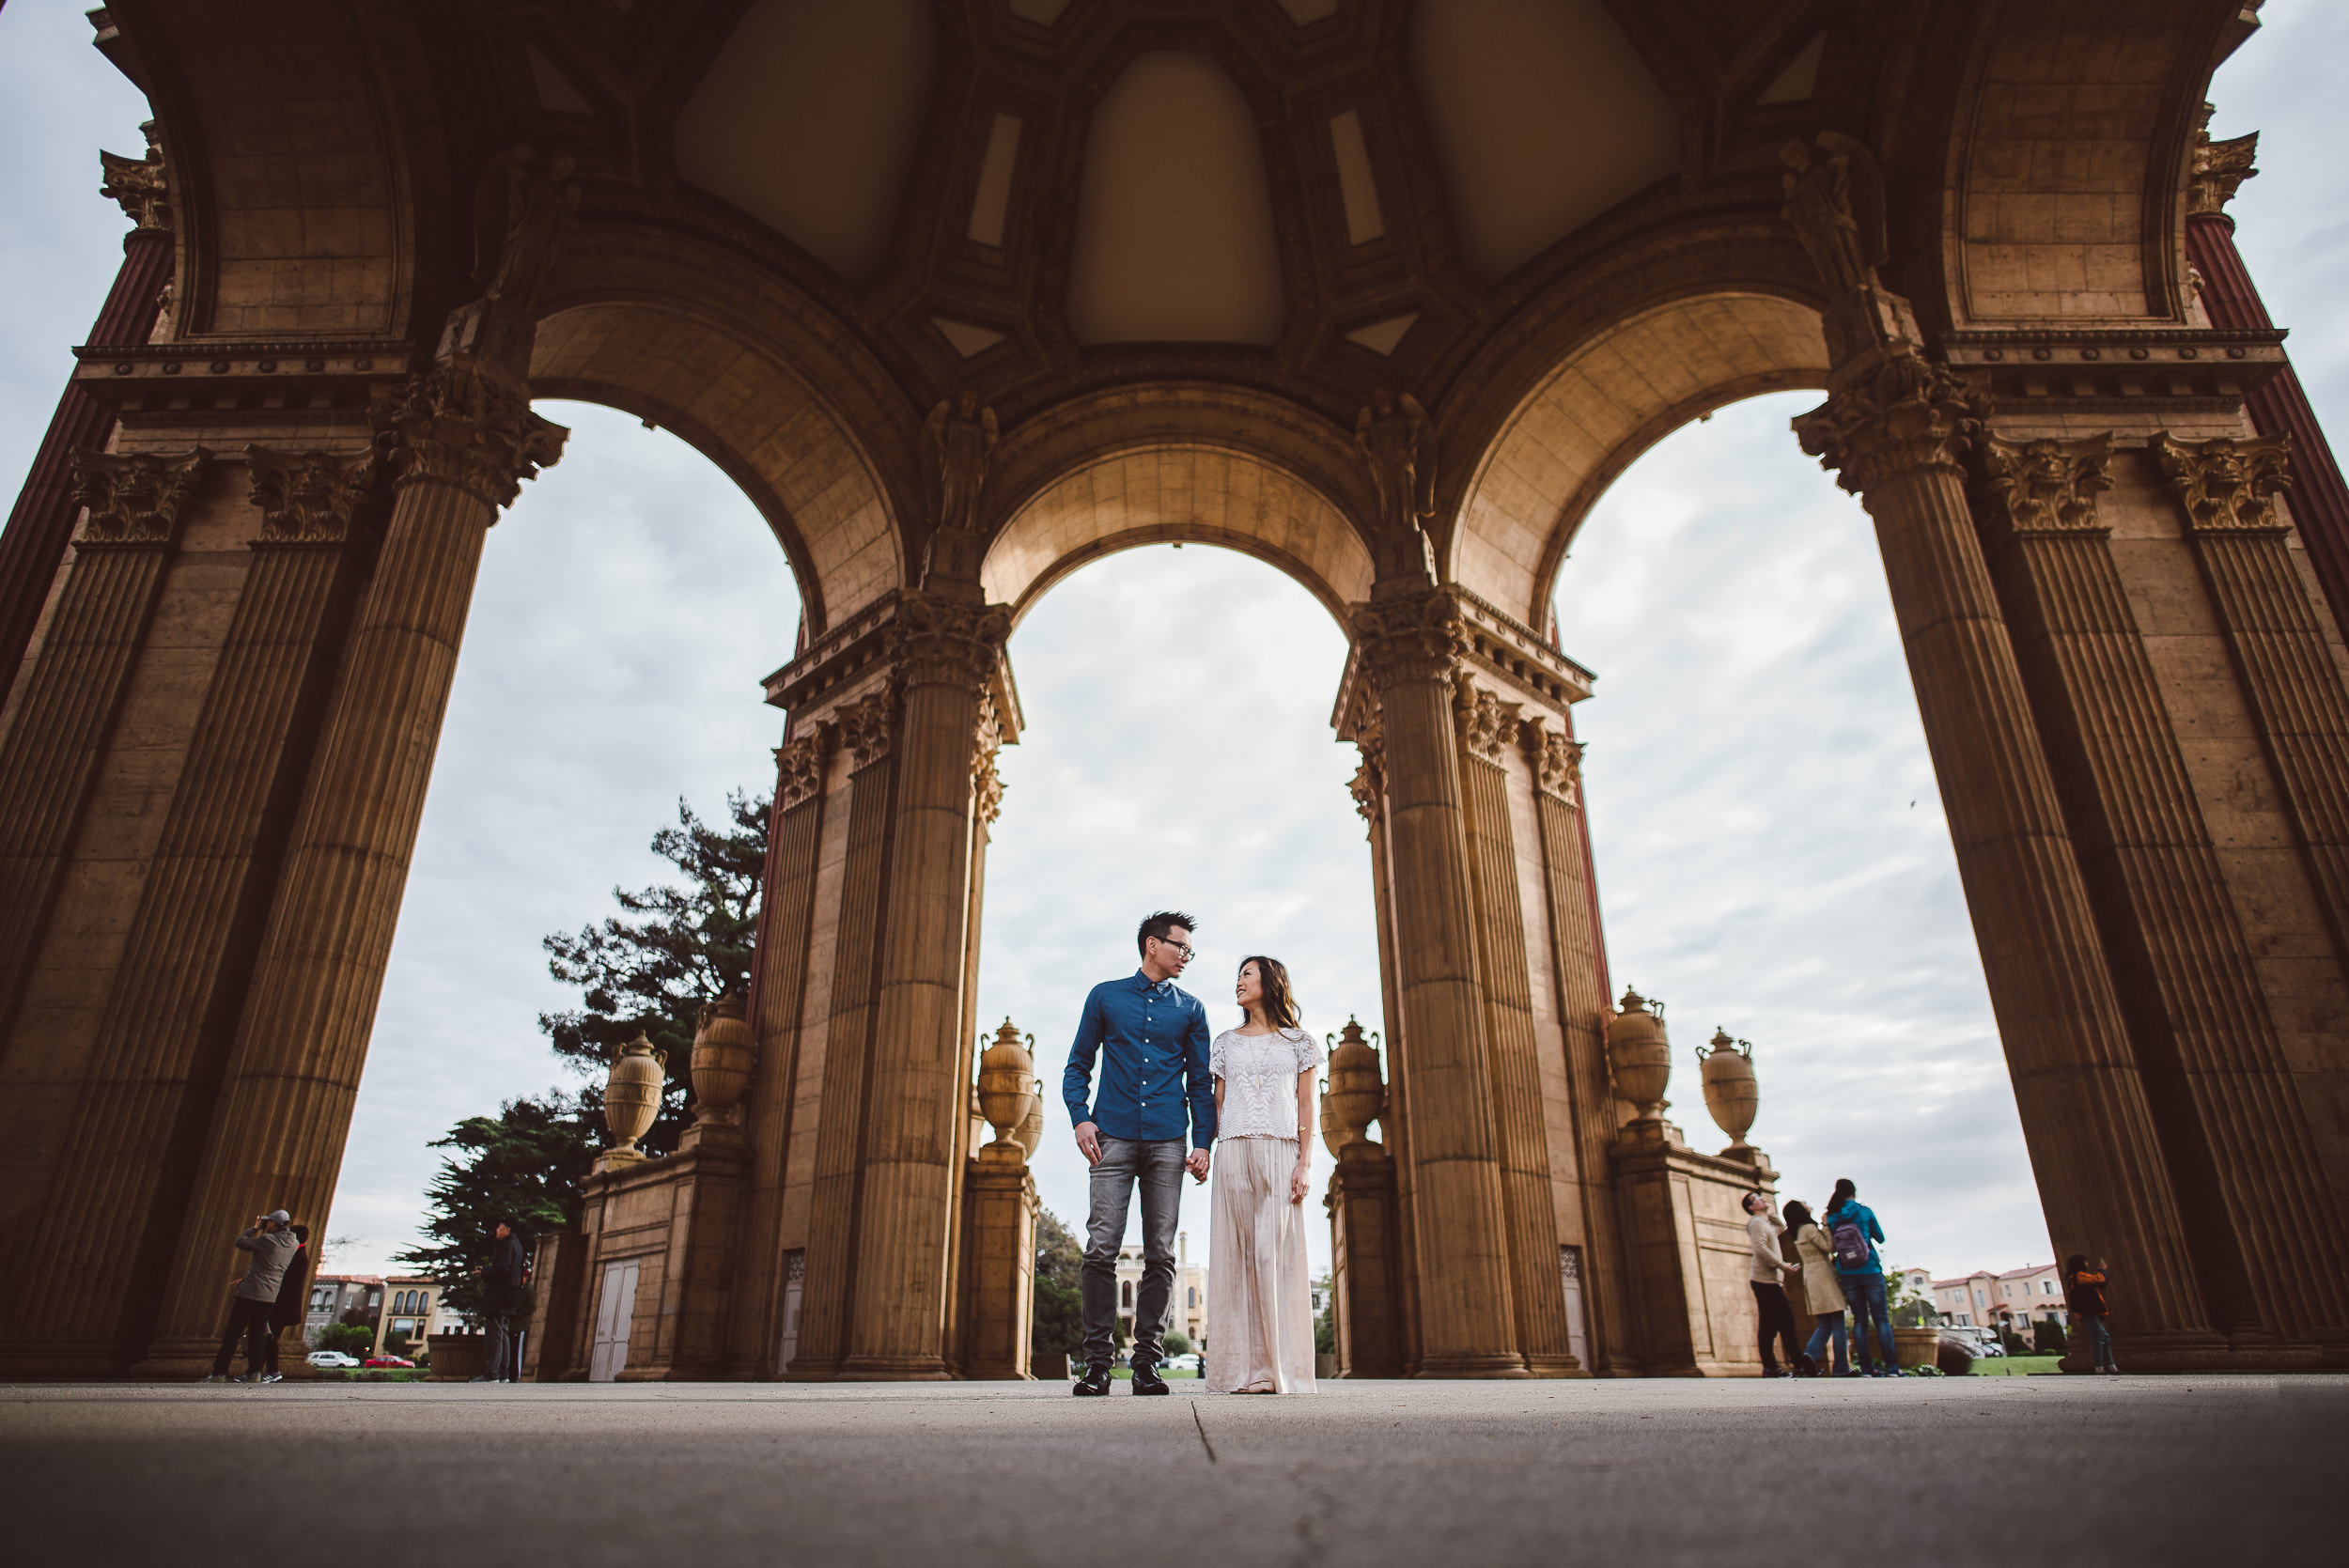 Palace-of-Fine-Arts-San-Francisco-Engagement-Photography-001.jpg